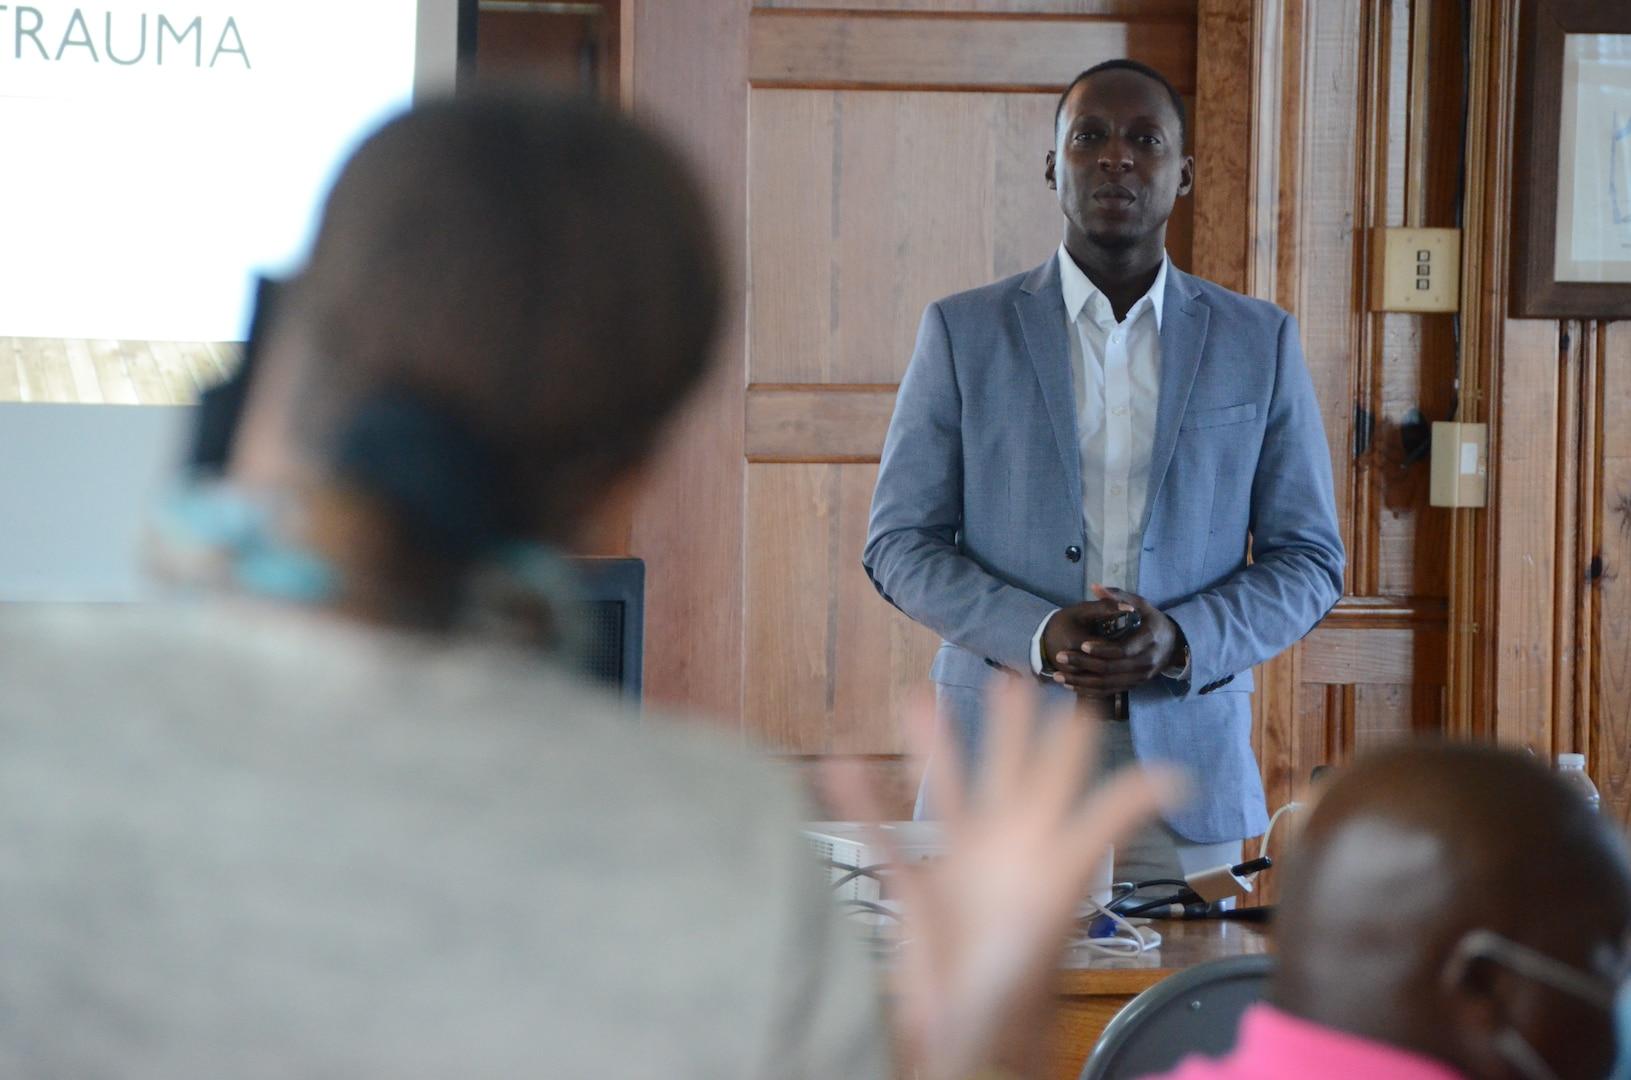 VNG SARC hosts victim advocate refresher training